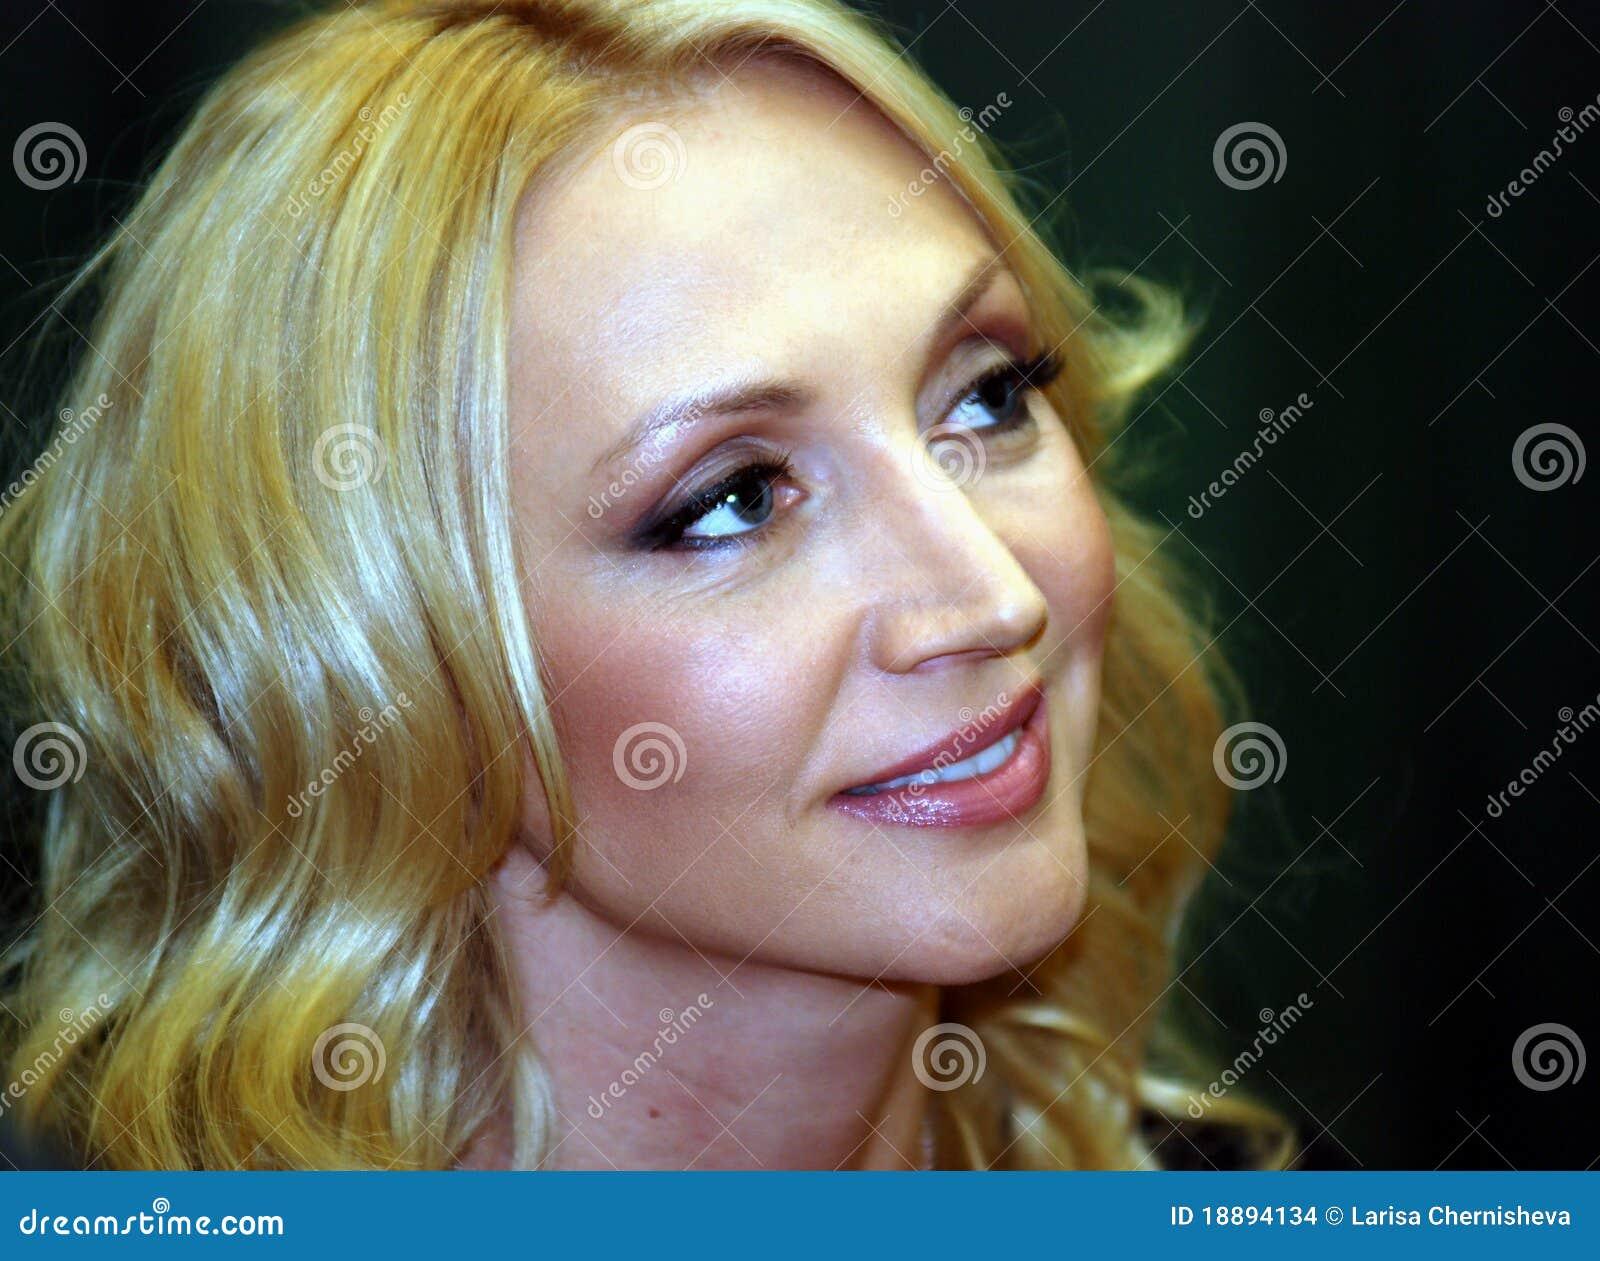 Beauty Christina Orbakaite struck by the similarity with Pugacheva on the new photo 03/02/2018 24